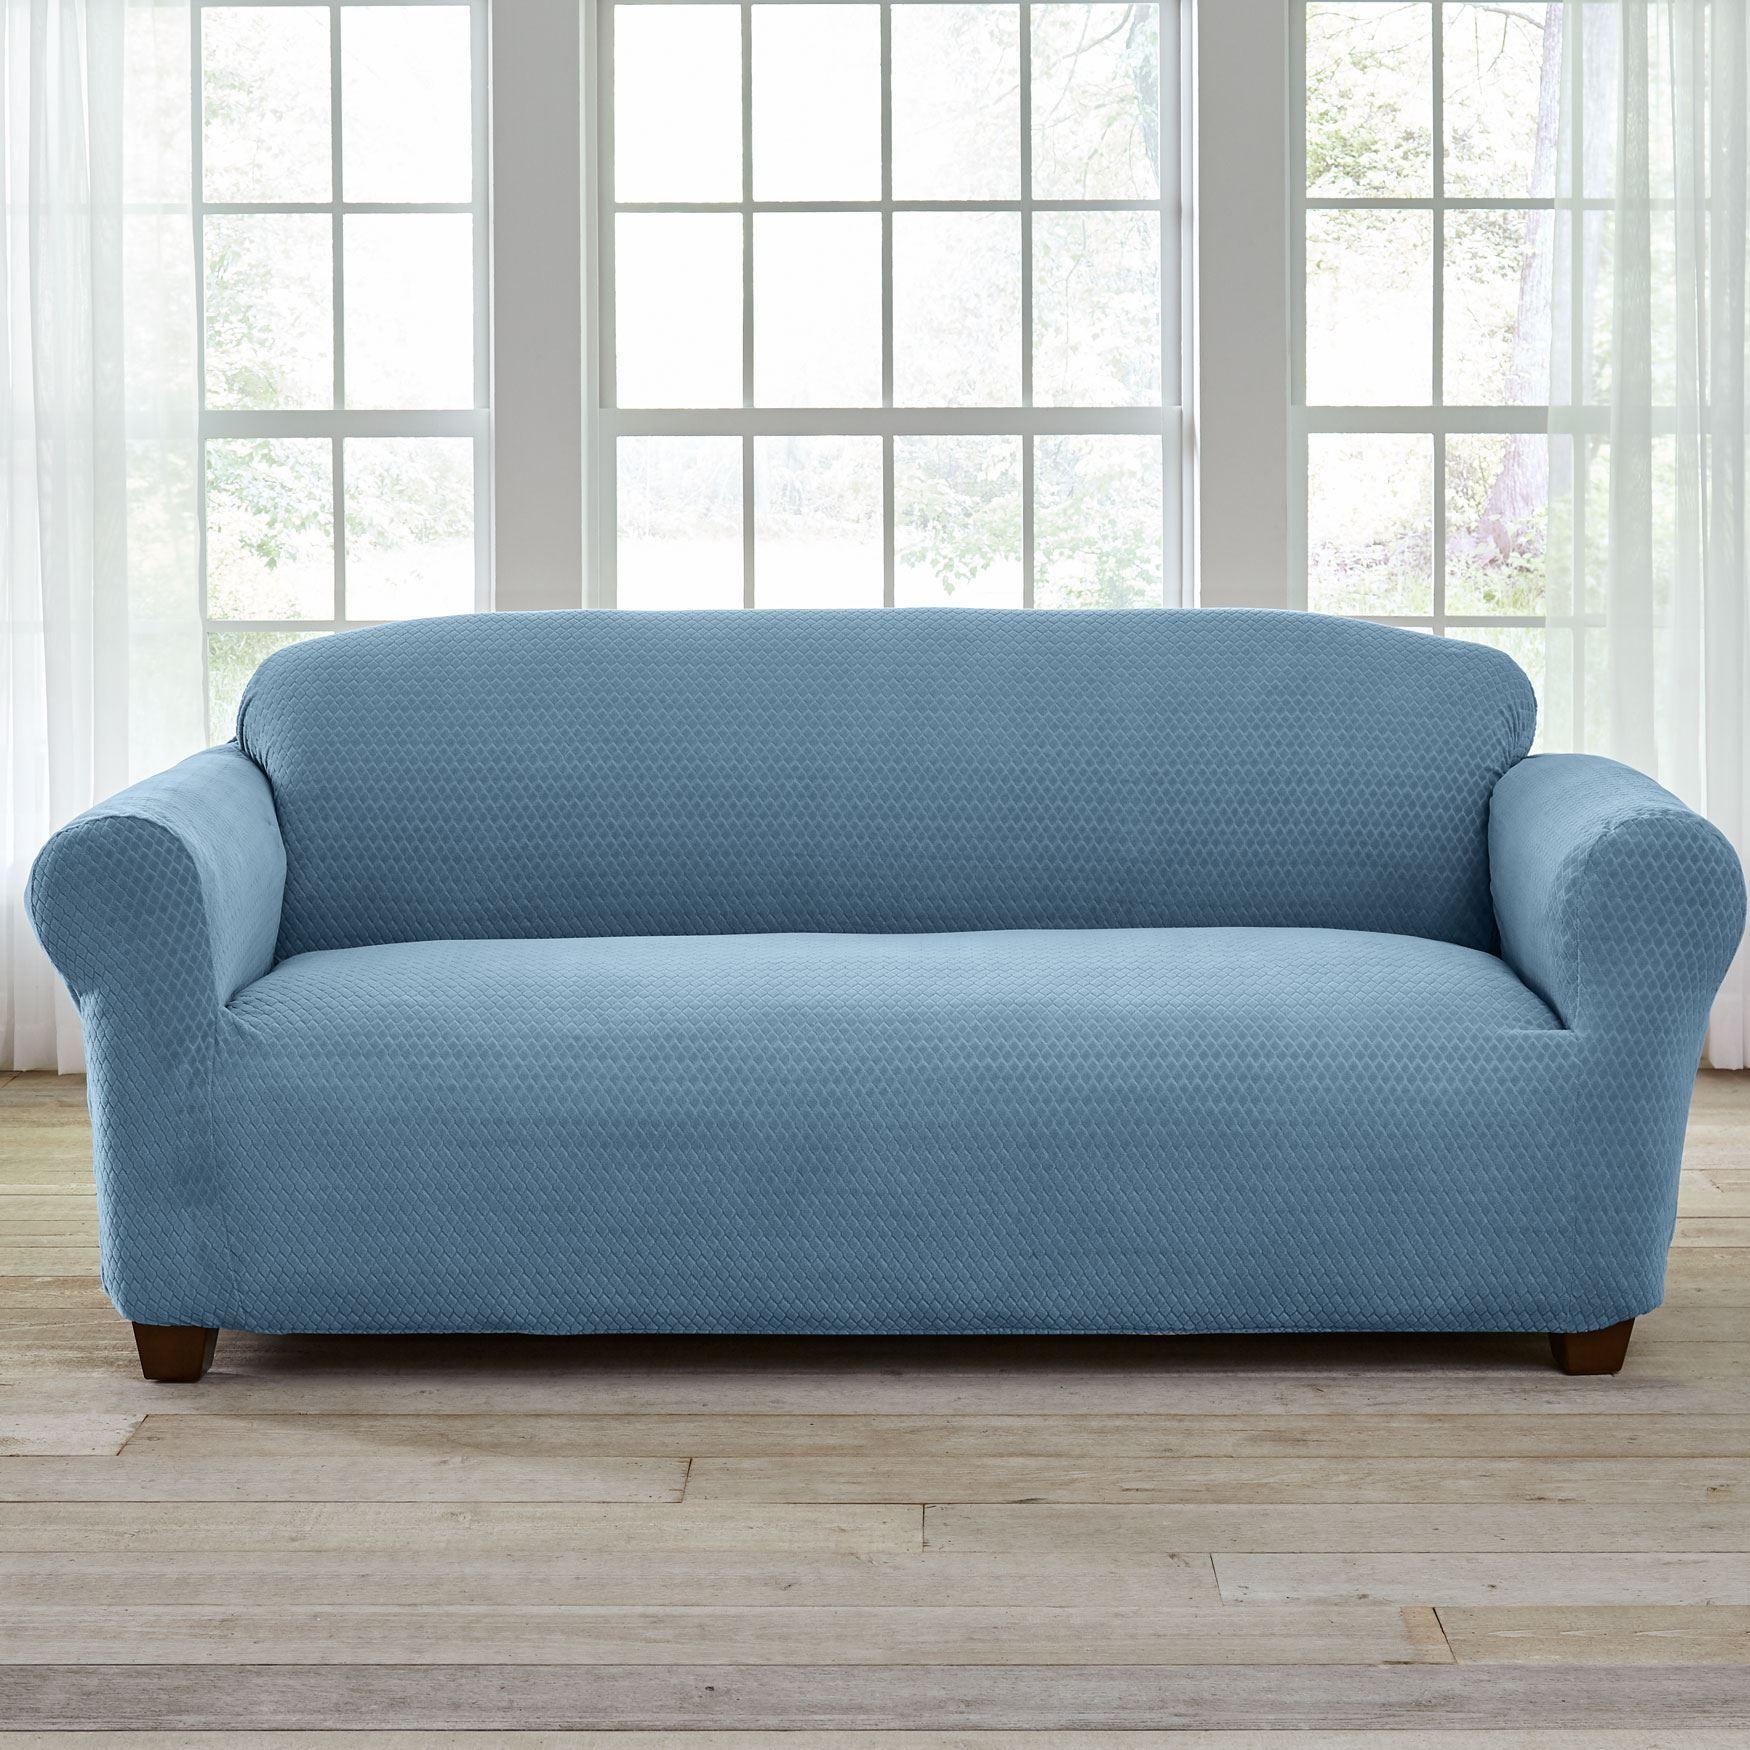 Bh Studio Stretch Diamond Sofa Slipcover Light Blue Slipcovered Sofa